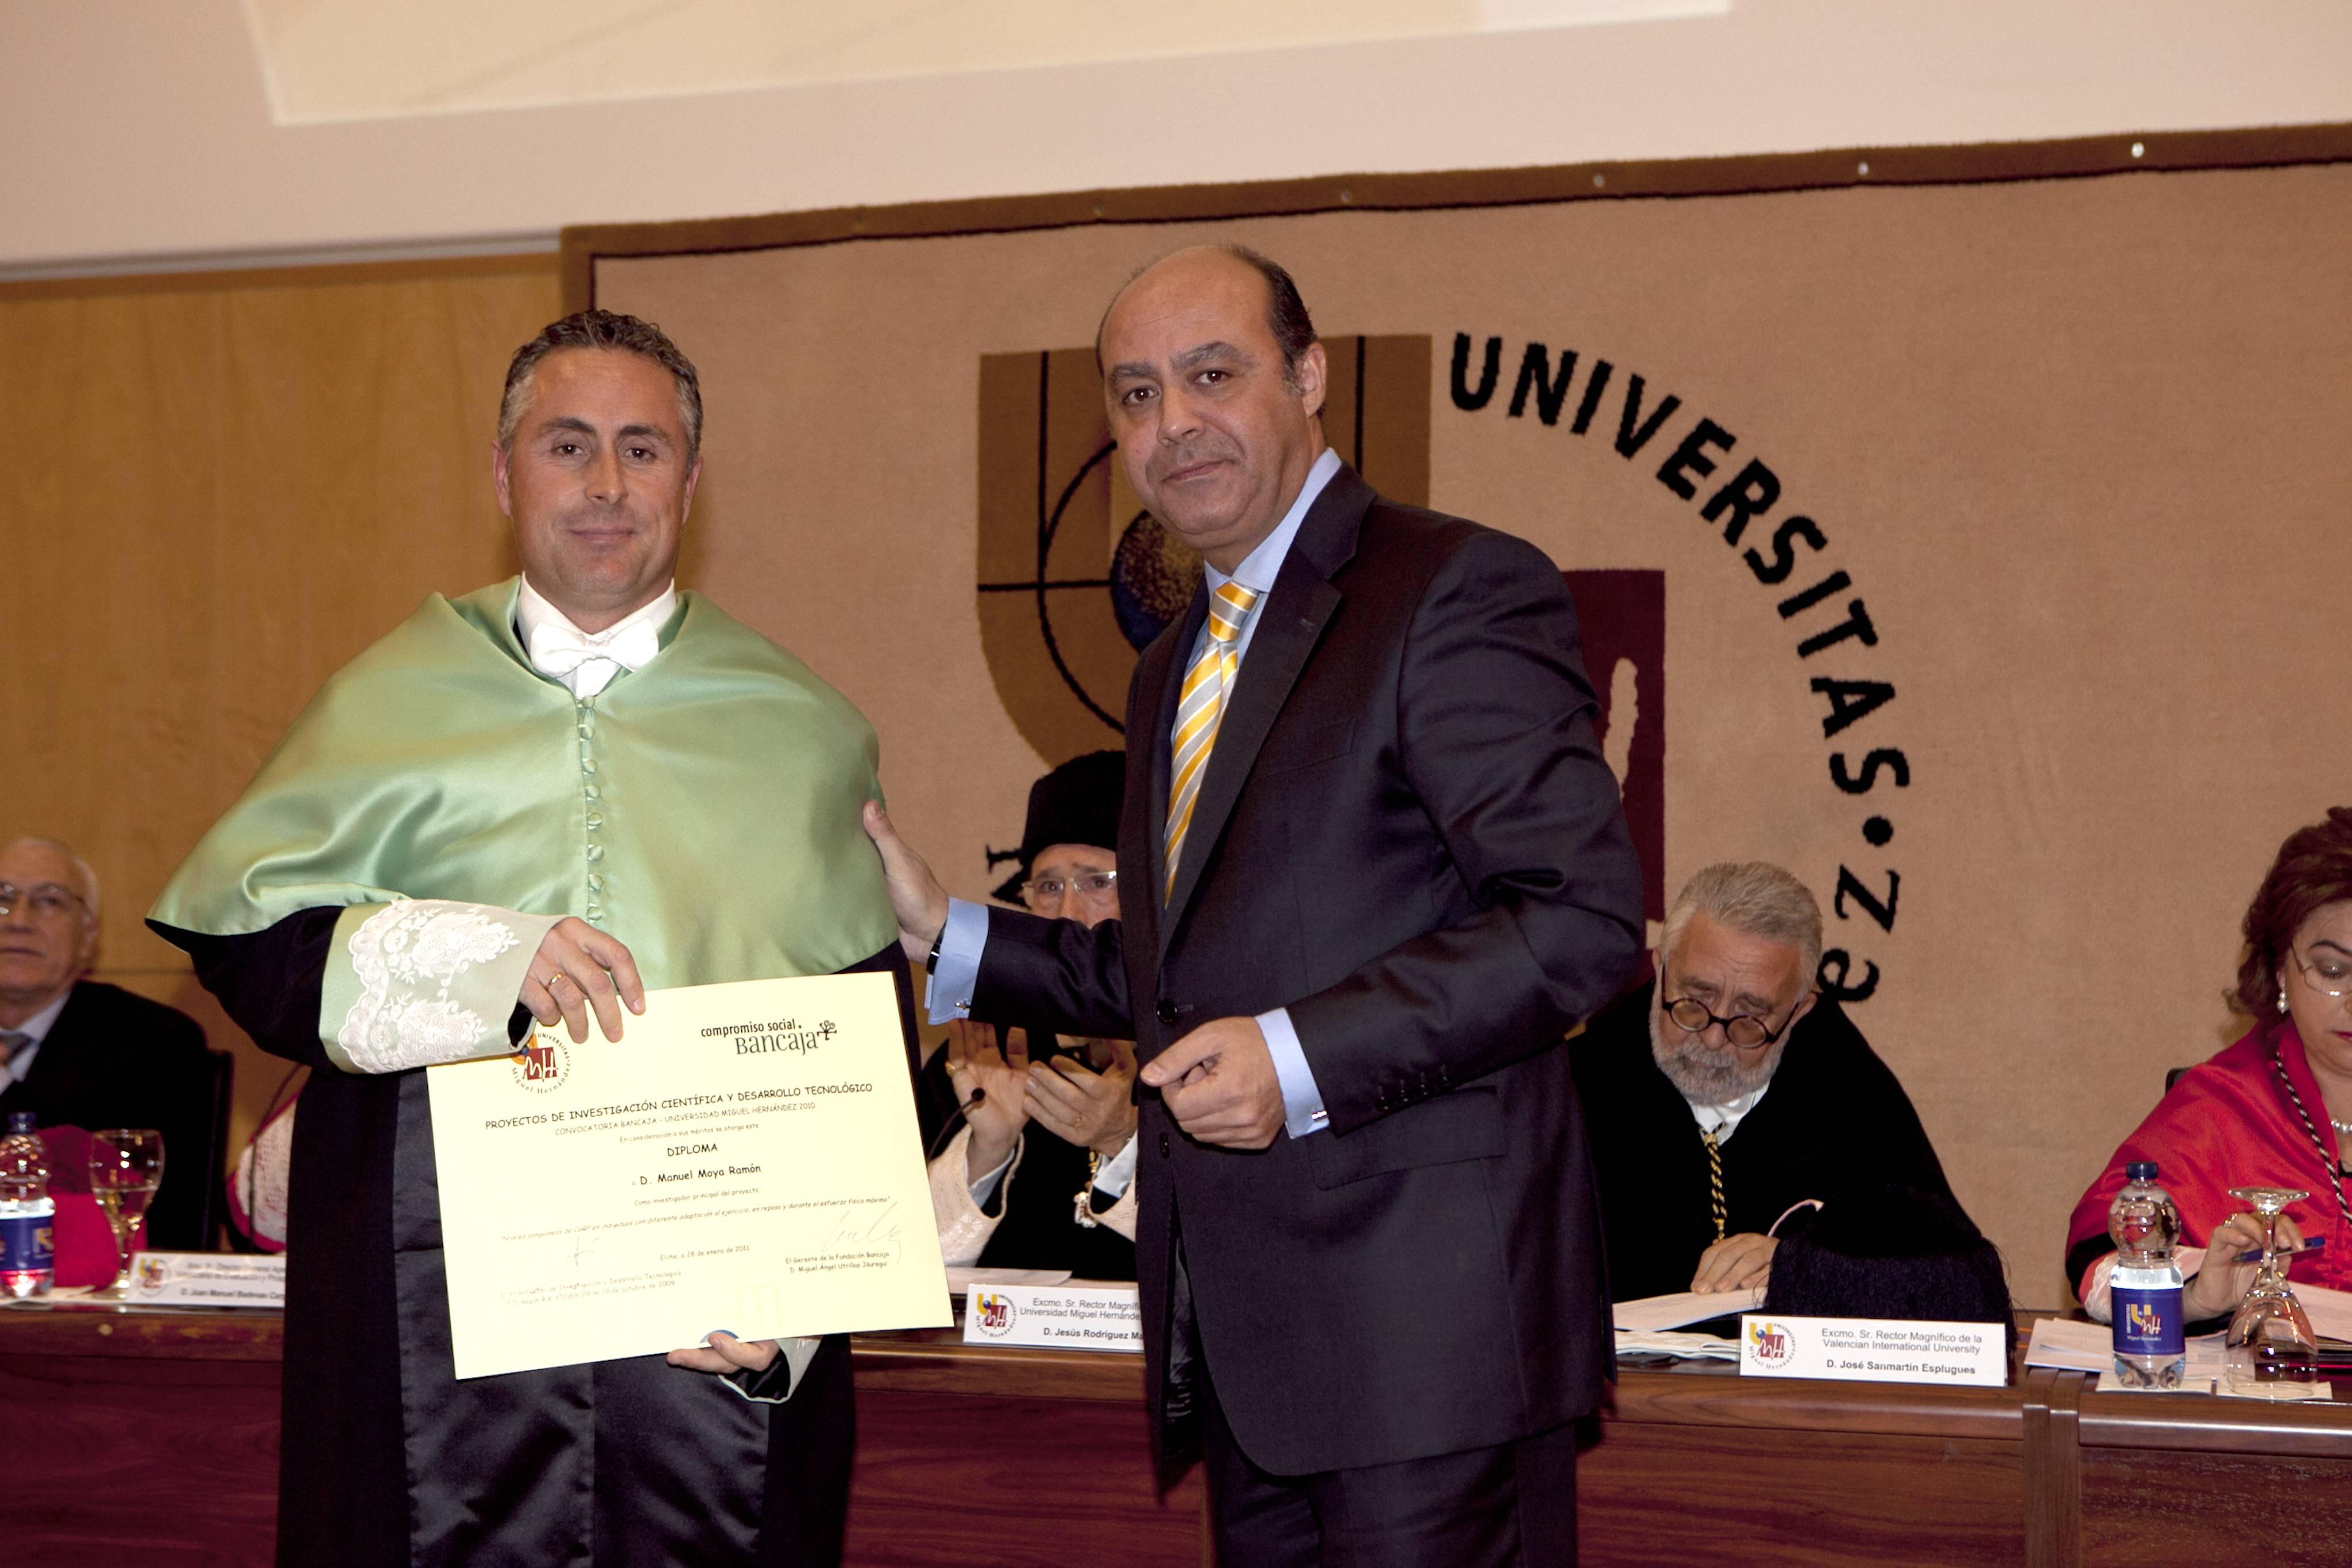 doctor-honoris-causa-luis-gamir_mg_1026.jpg